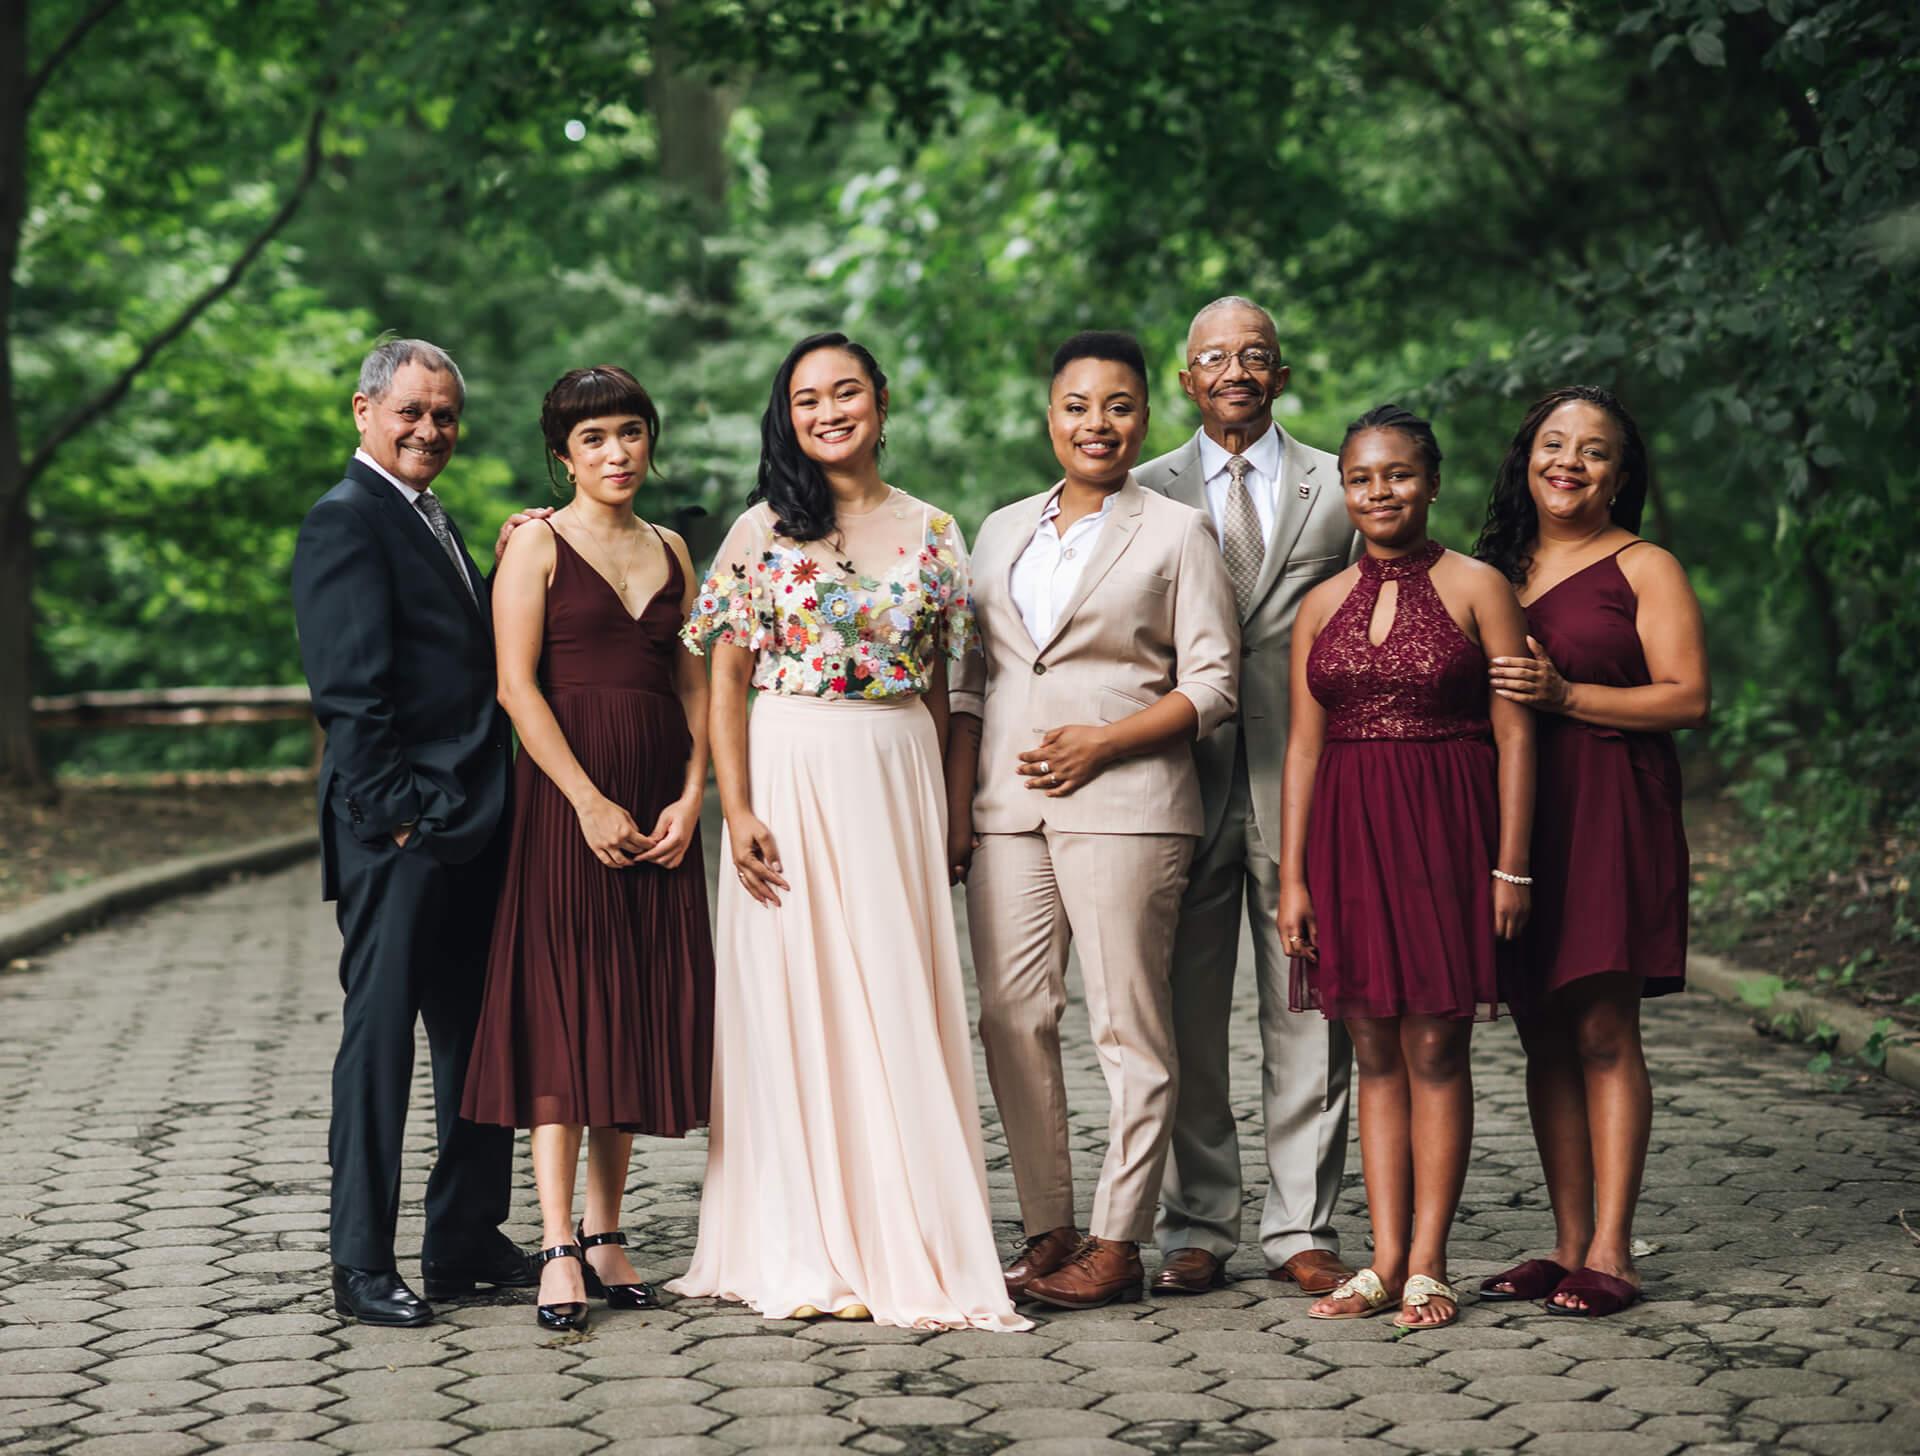 BROOKLYN SOCIETY FOR ETHICAL CULTURE - INTIMATE WEDDING - CHI-CHI ARI-131 (1).jpg